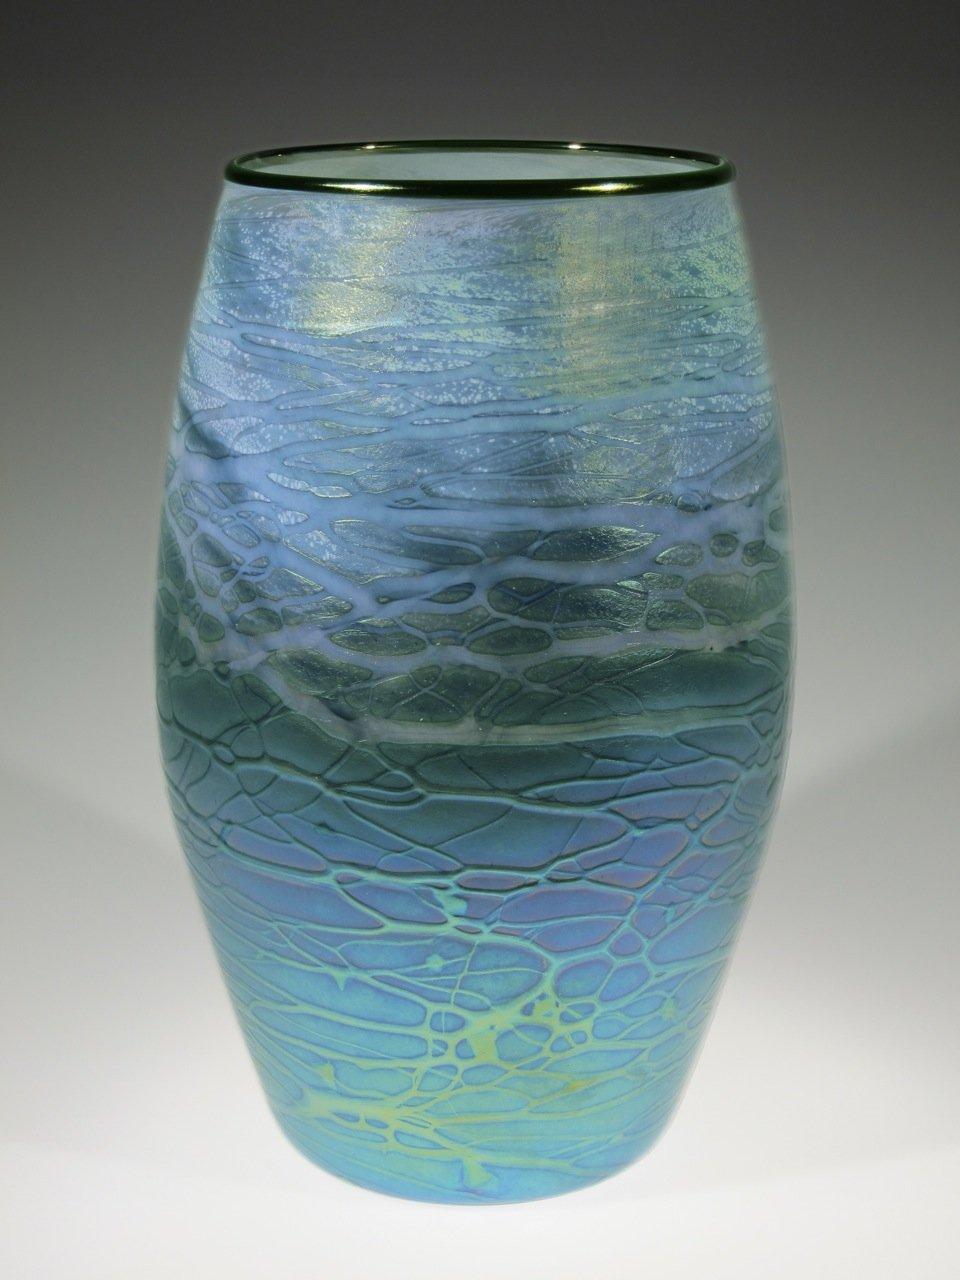 Blue Green Cylinder By Tom Stoenner Art Glass Vase Artful Home